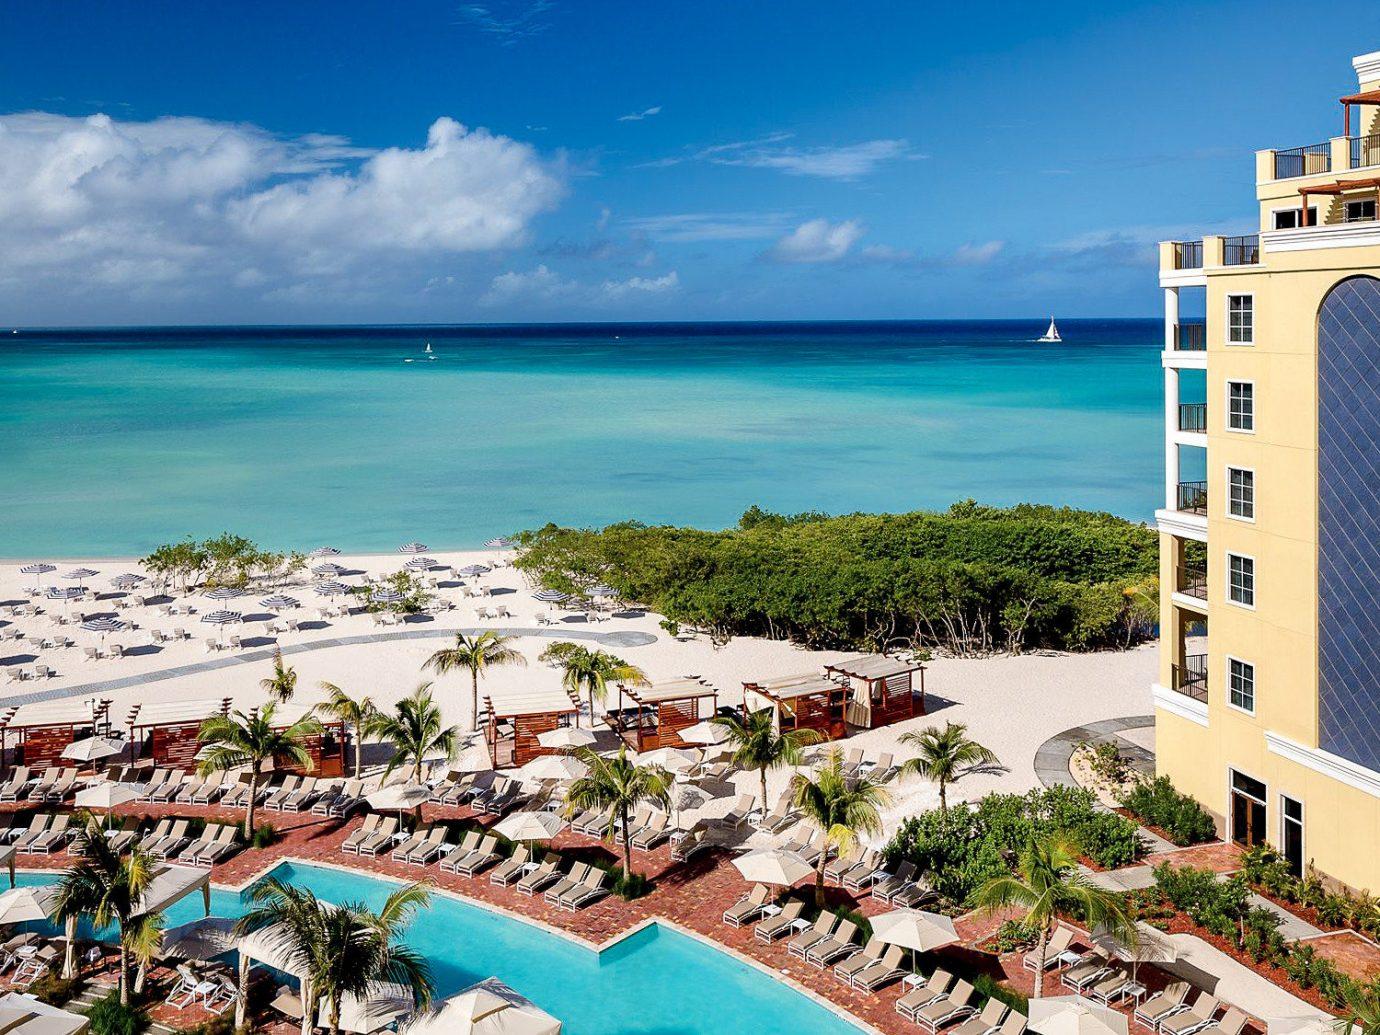 Hotels Romance sky water Resort outdoor vacation tourism Sea real estate Nature leisure Beach caribbean condominium Ocean hotel travel palm tree shore